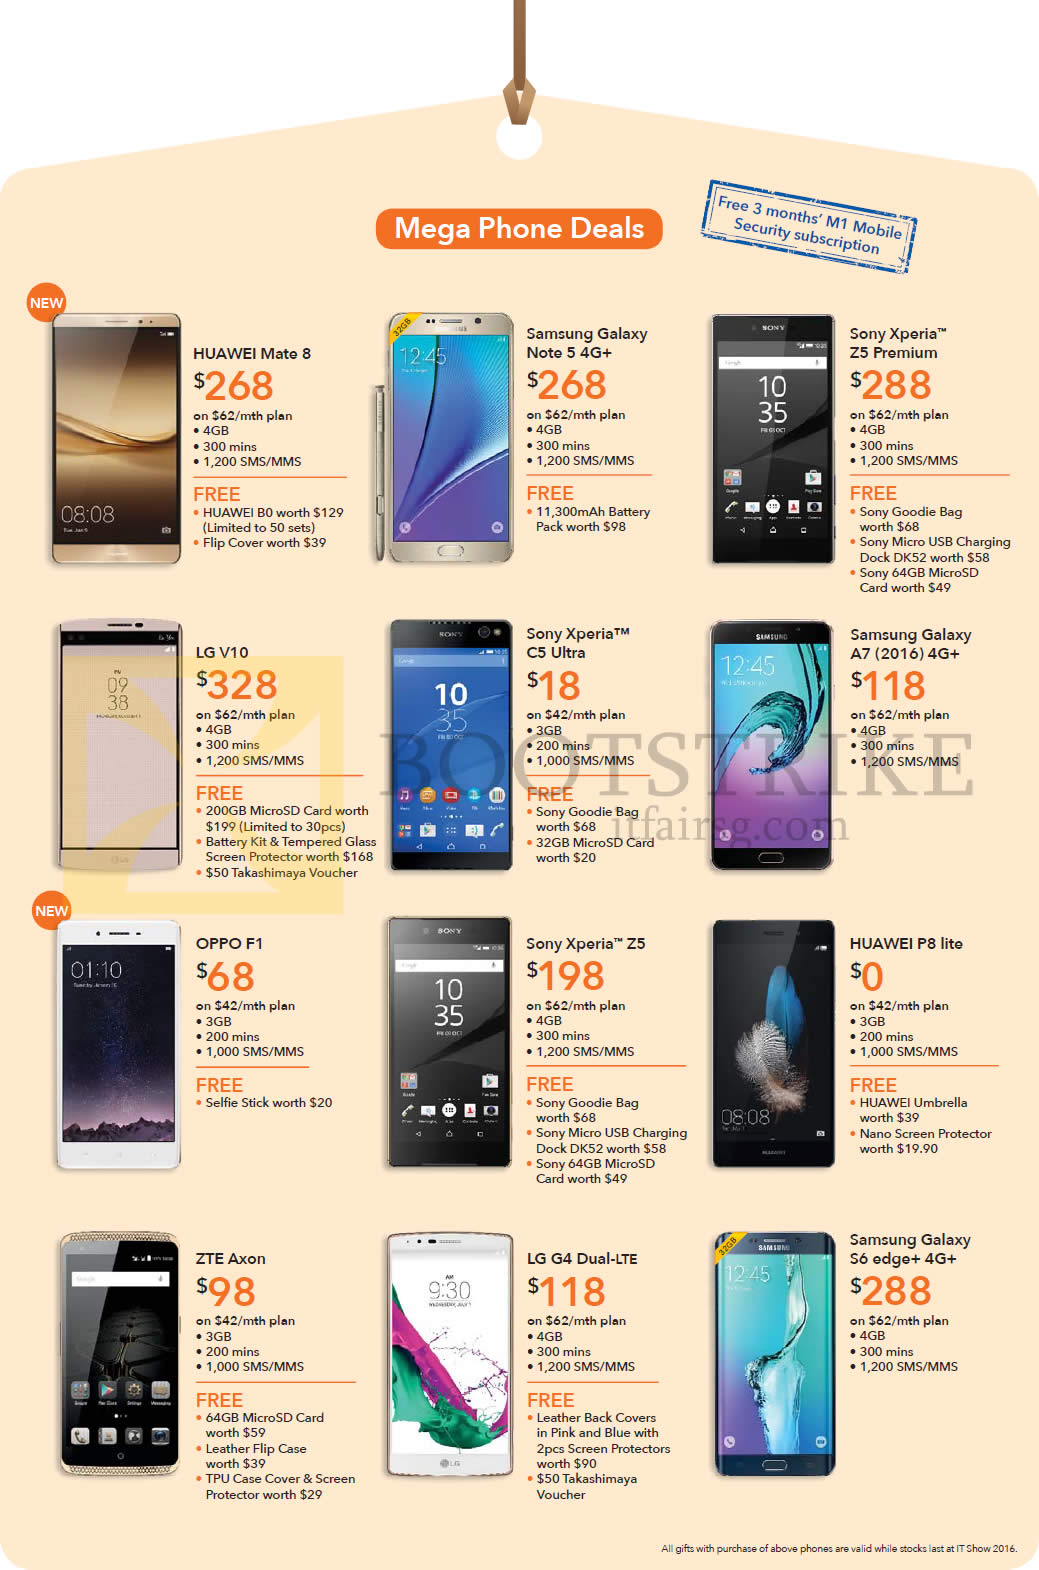 huawei phones price list p8 lite. mobile phones huawei mate 8, p8 lite, samsung galaxy note 5, a7, s6 edge plus, sony xperia z5 premium, c5 ultra, z5, lg v10, g4 dual, oppo f1, zte axon price list lite 8